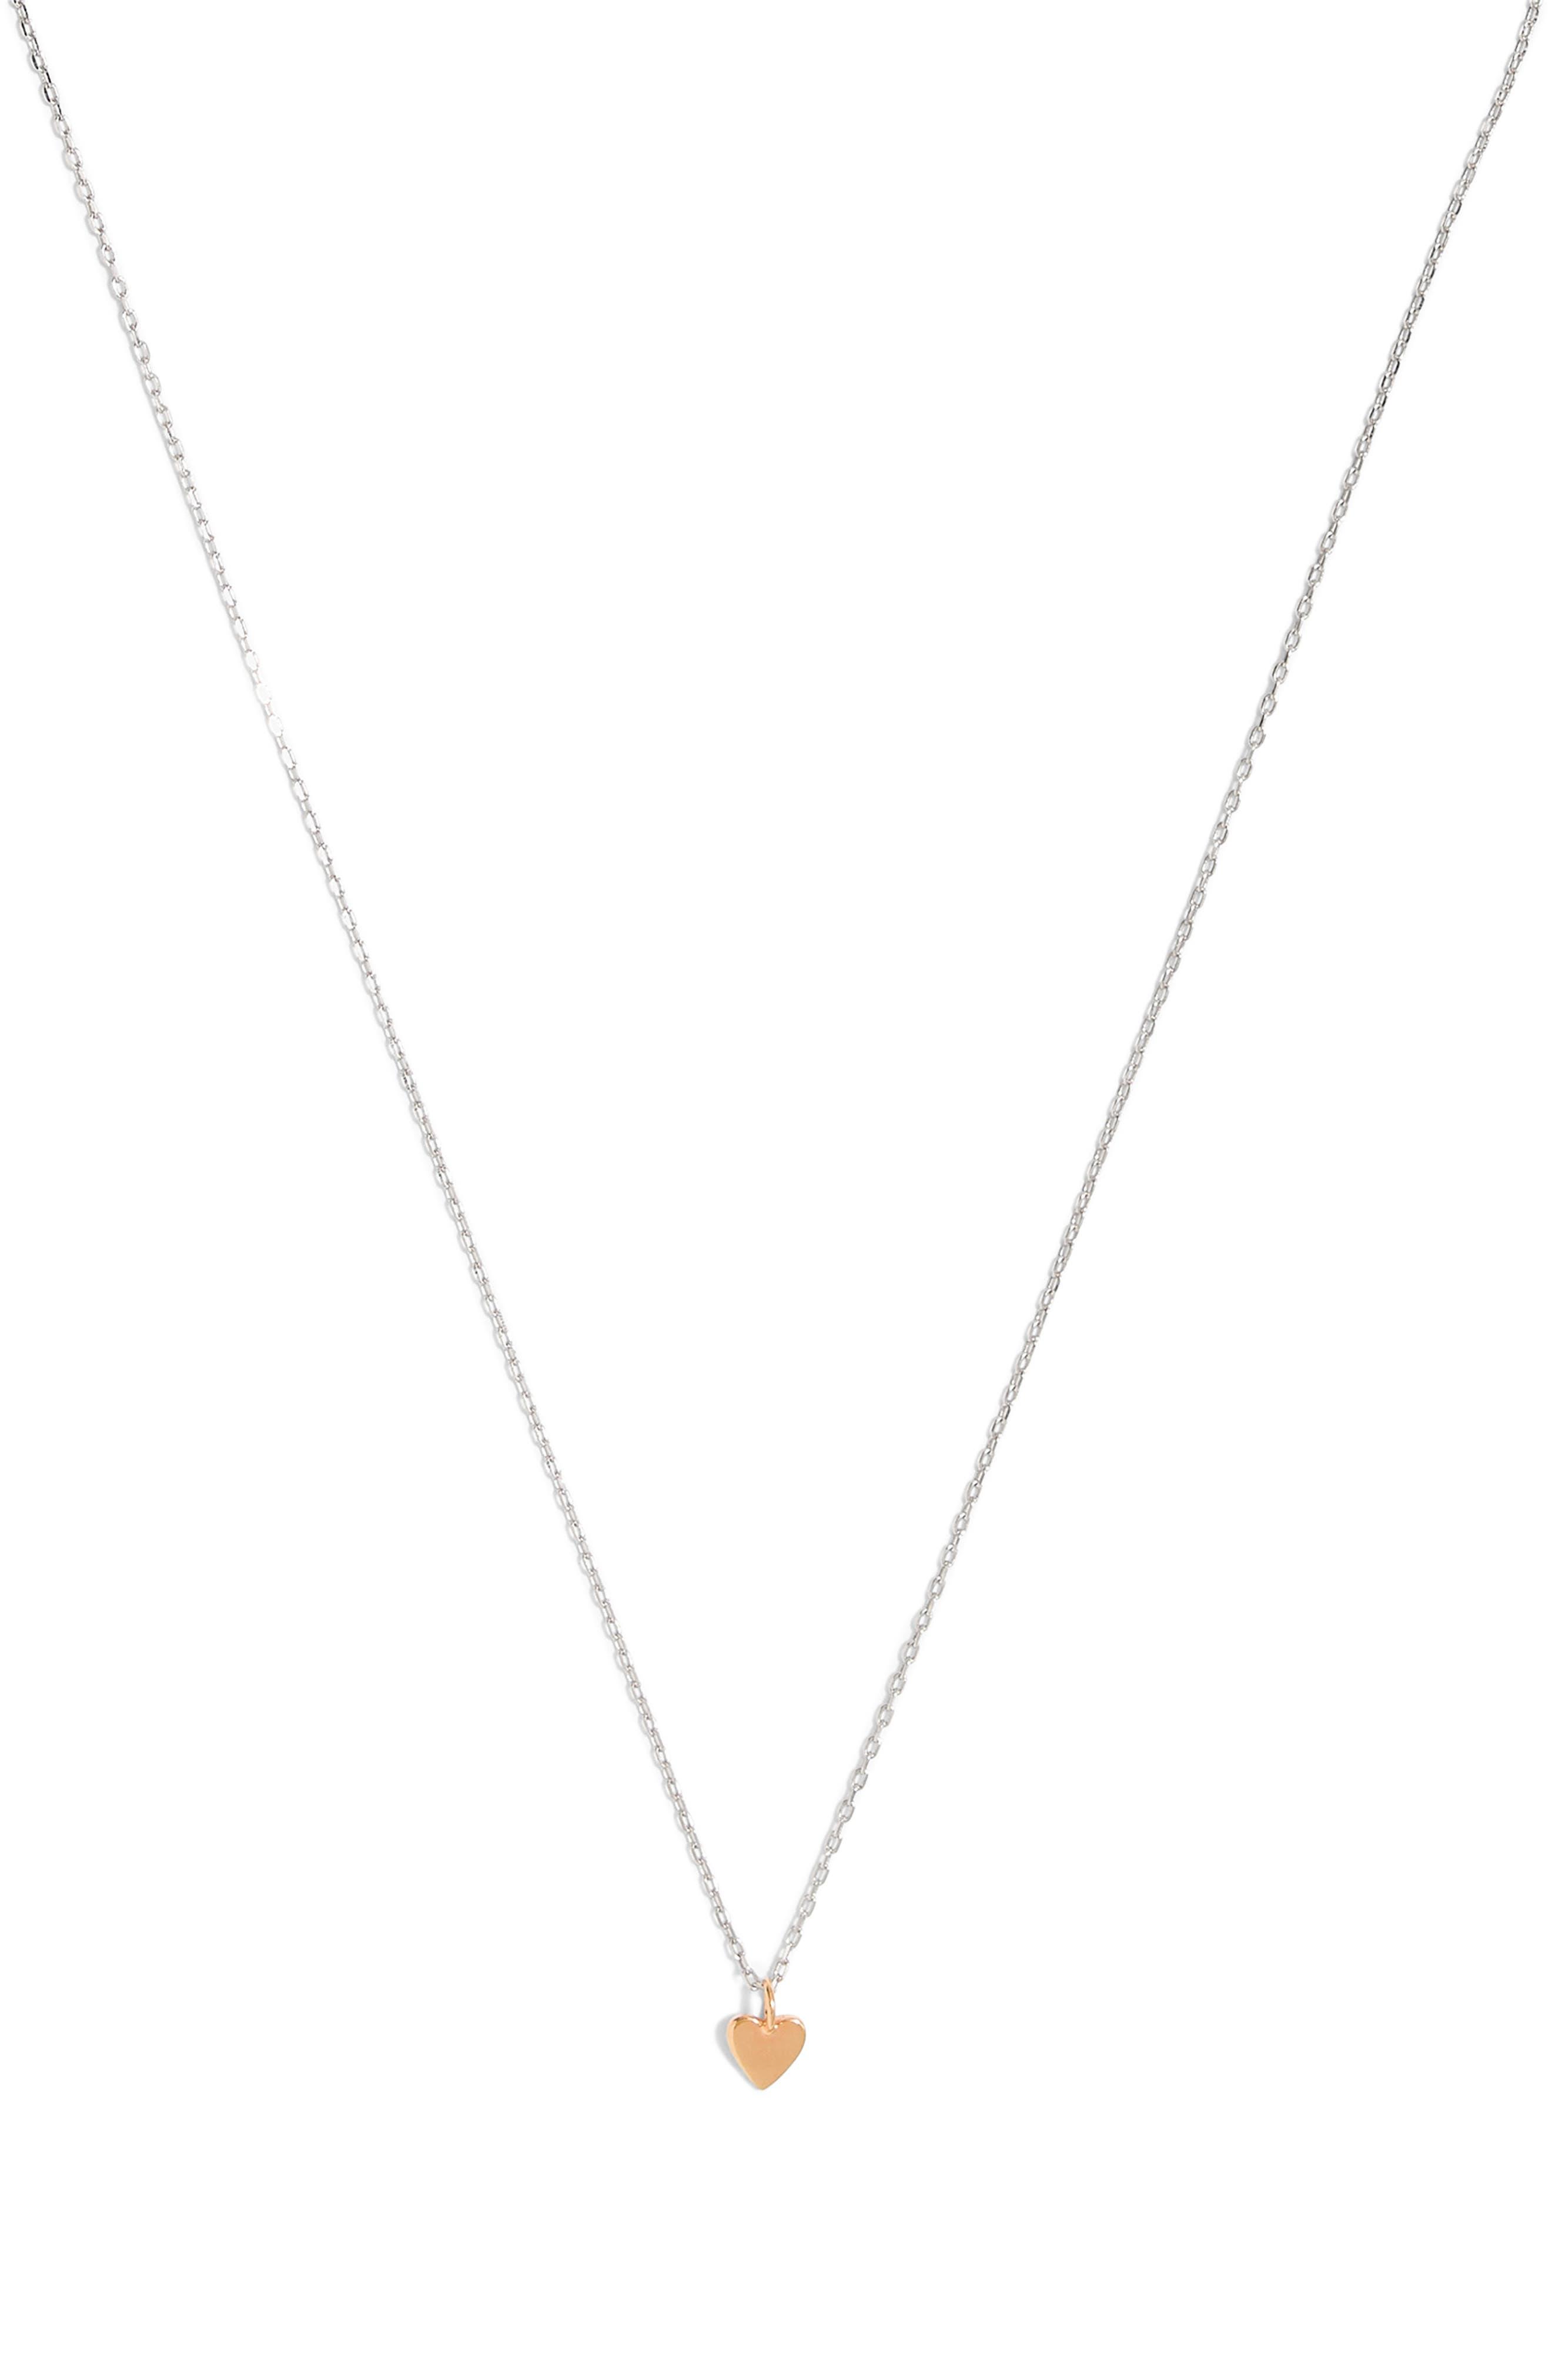 MADEWELL, Vermeil Pendant Necklace, Main thumbnail 1, color, 710